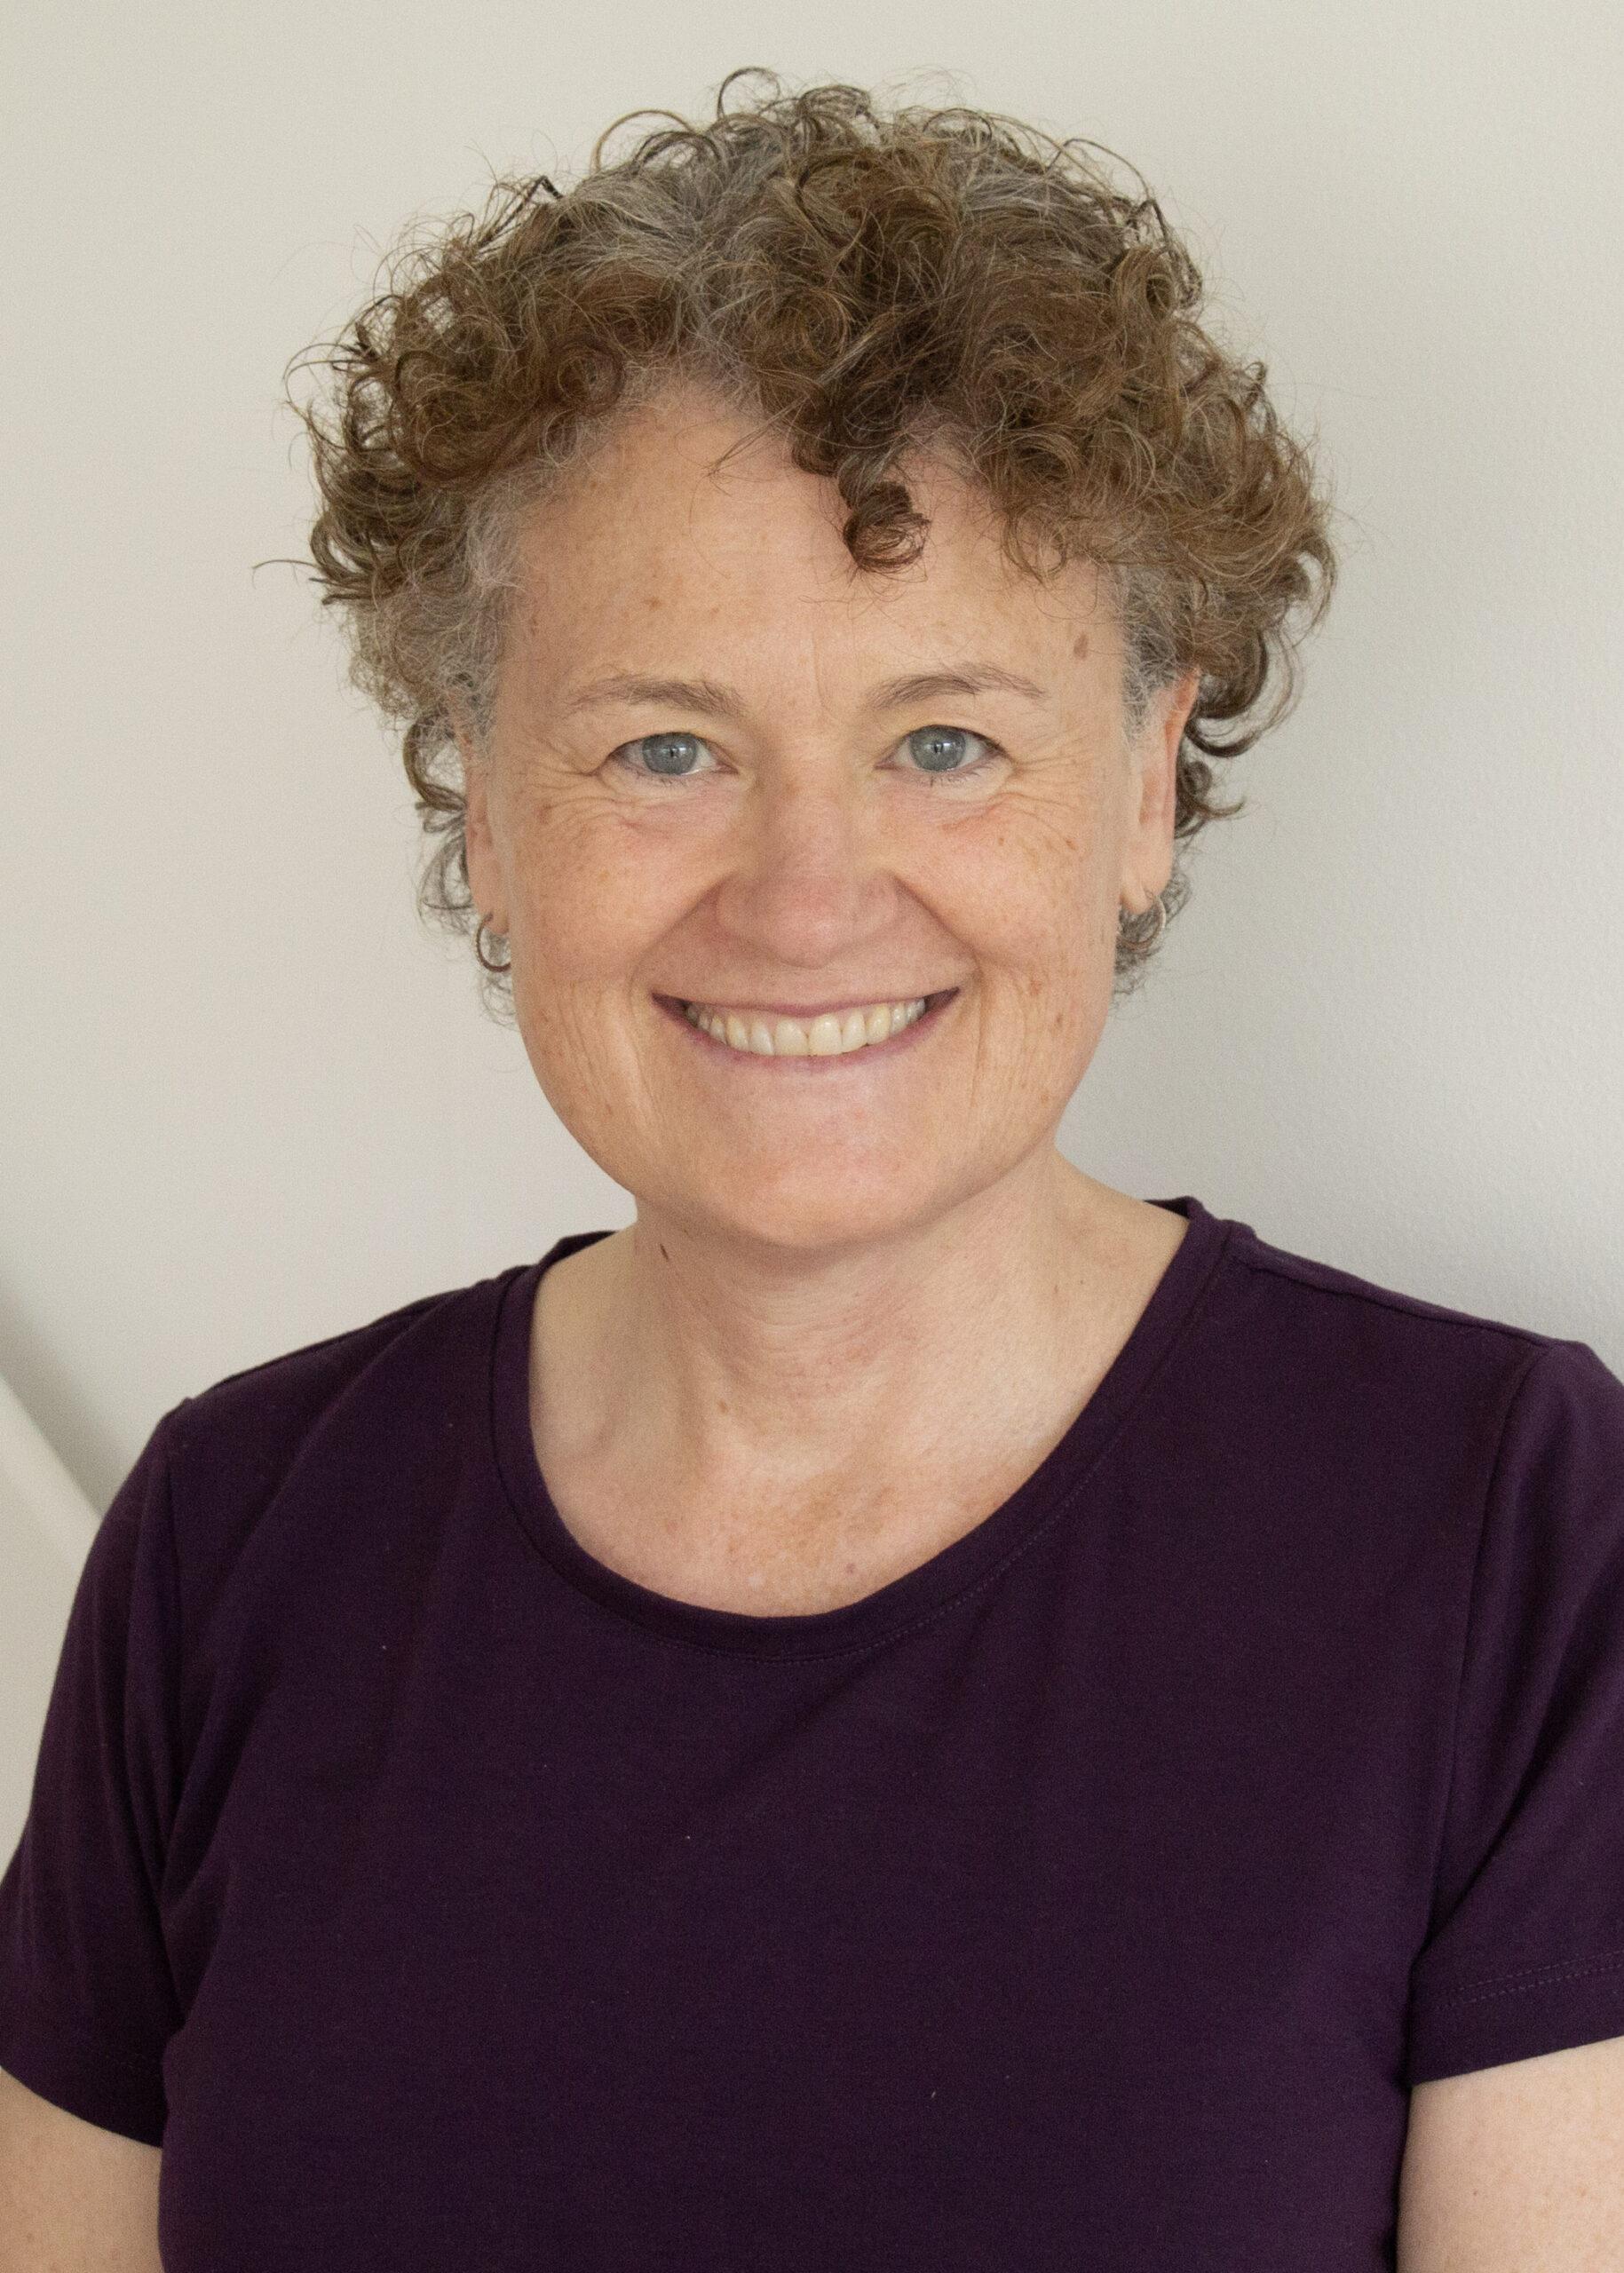 Professor Anita McGahan